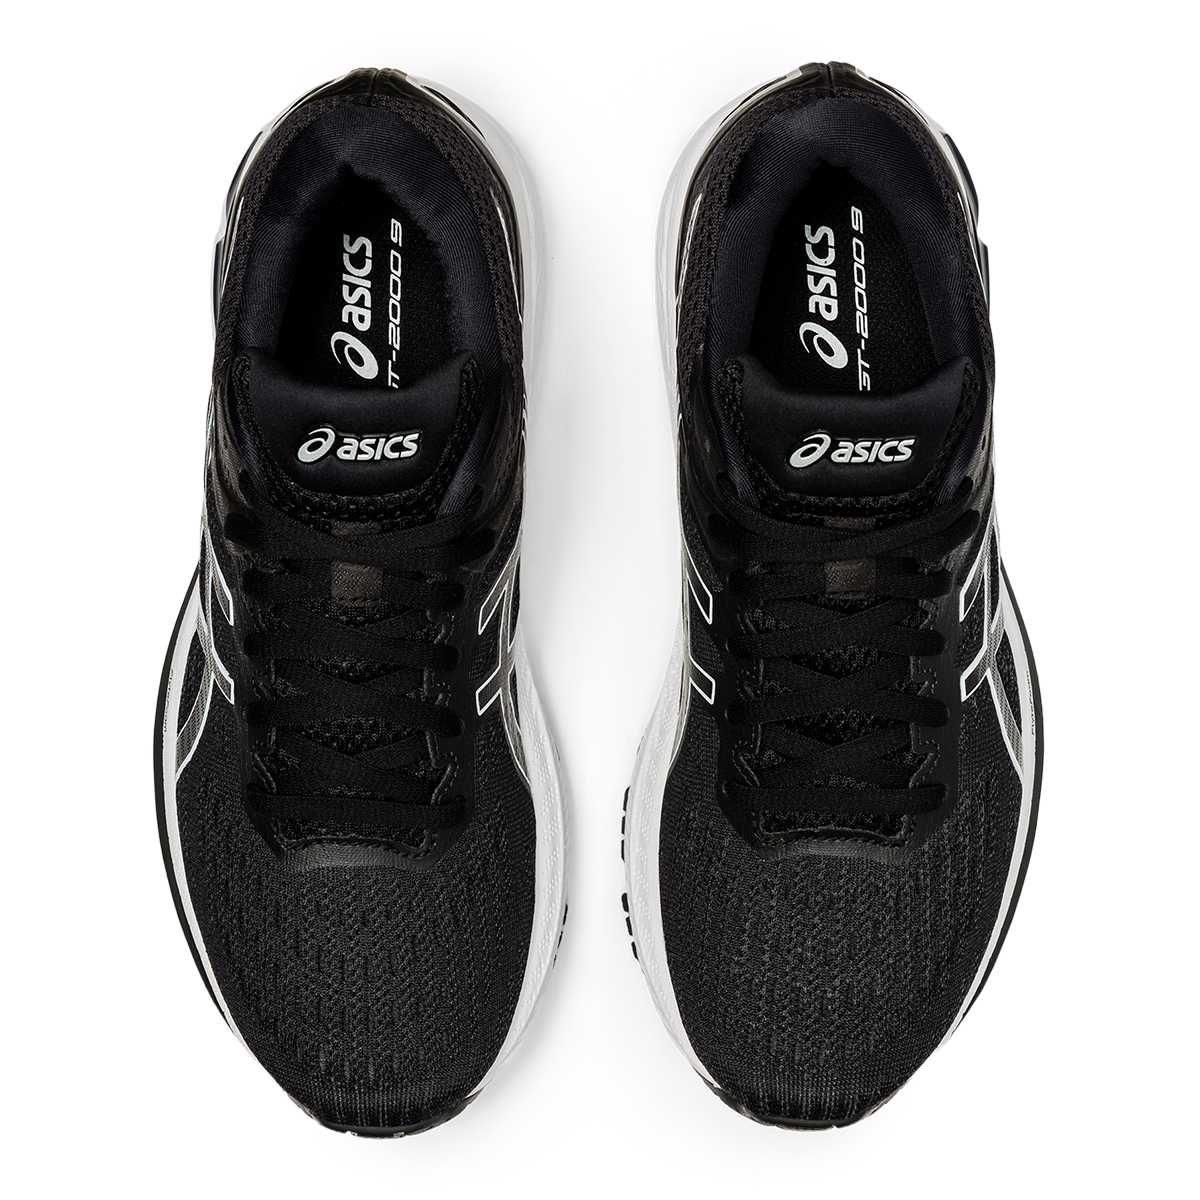 Women's Asics Gt-2000 9 Running Shoe - Color: Black/White - Size: 5 - Width: Regular, Black/White, large, image 5